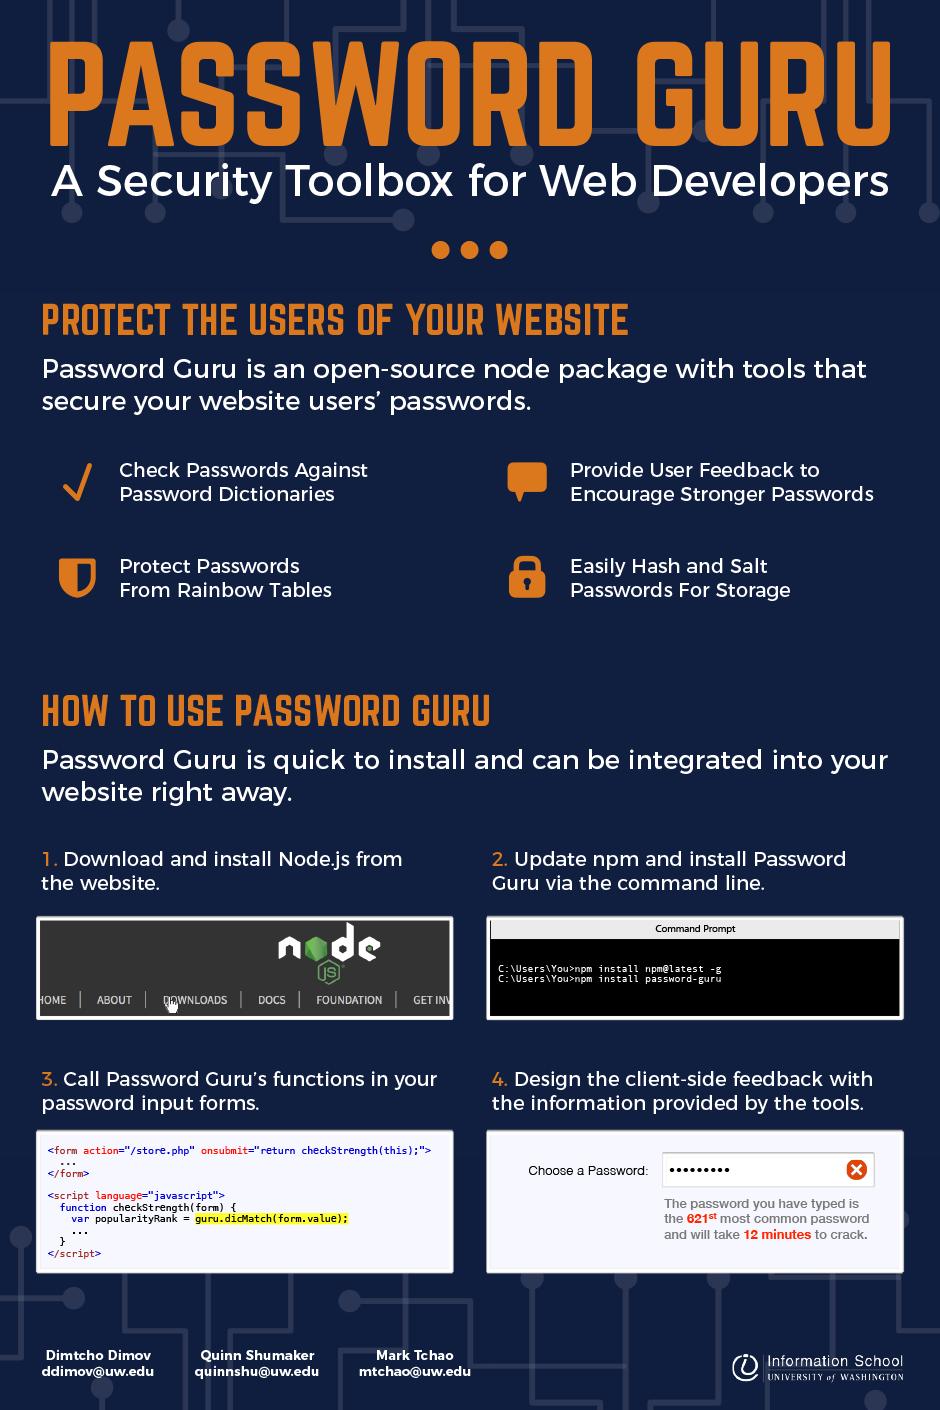 Password Guru | Information School | University of Washington